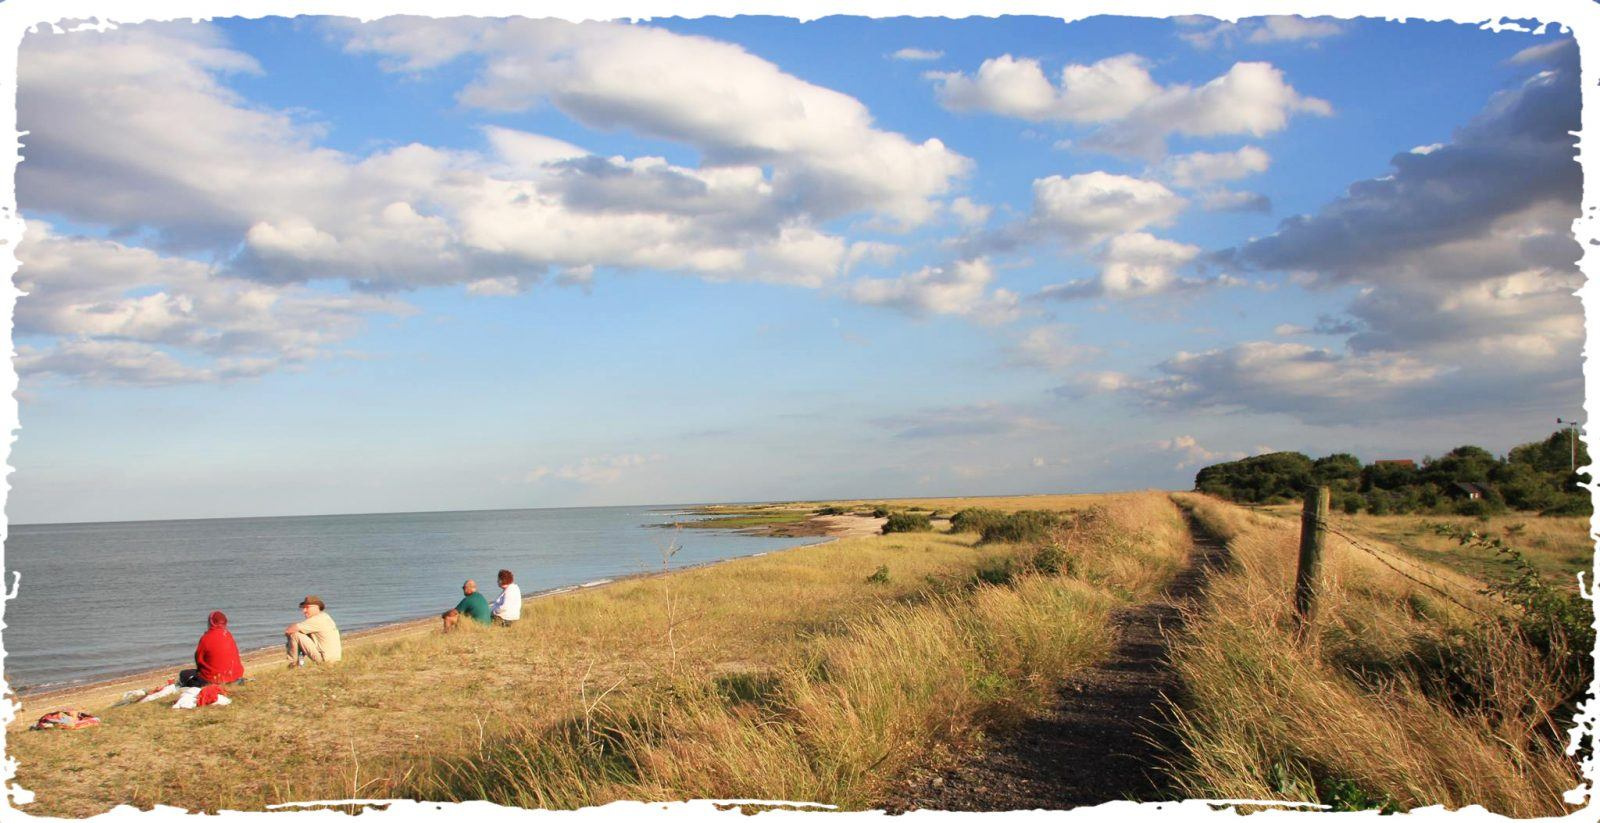 The coast line at Othona Community spiritual retreat in the UK